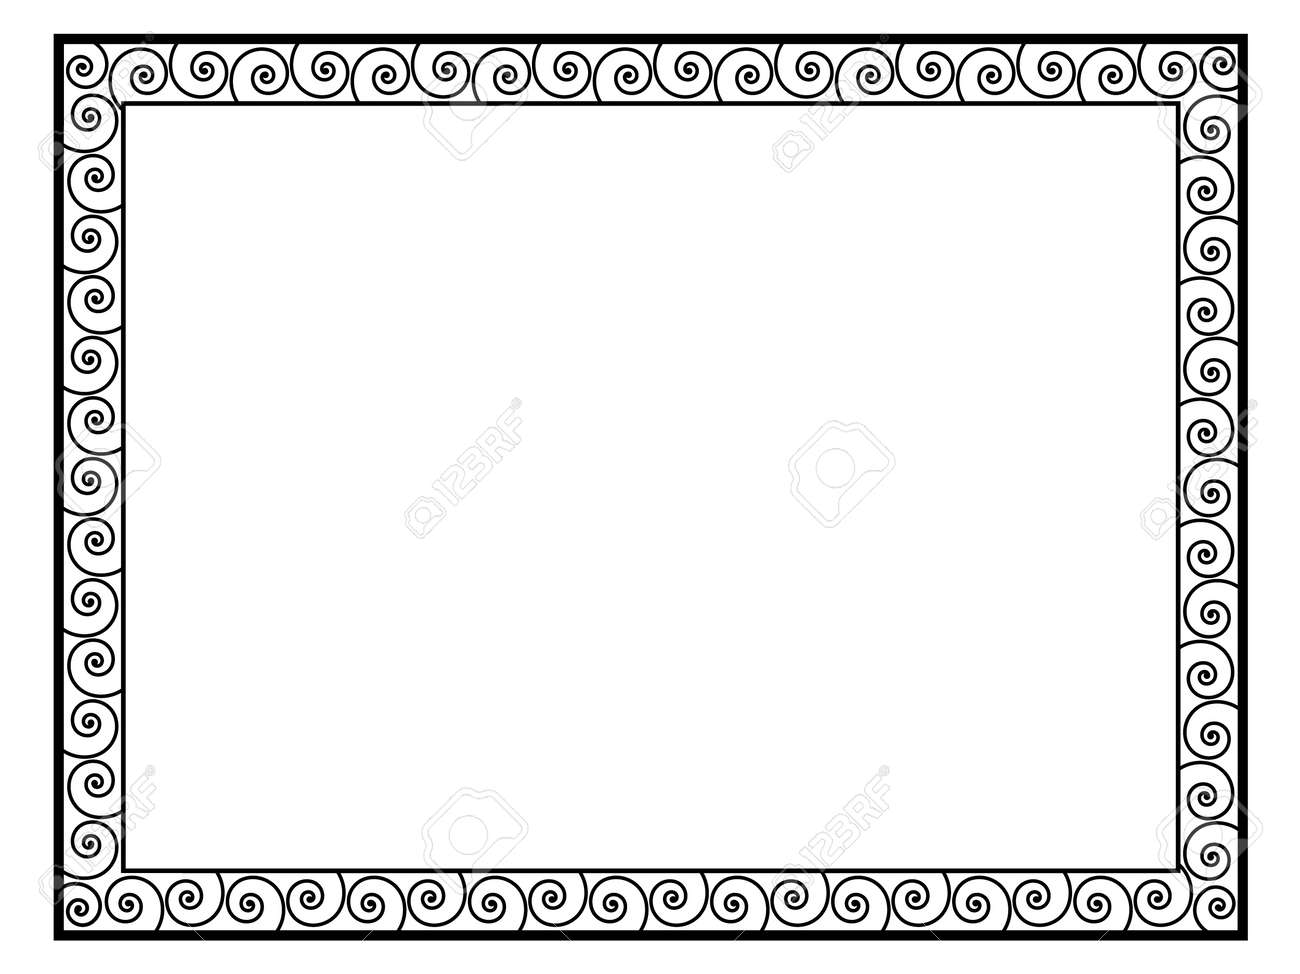 Greek style black ornamental decorative frame pattern isolated greek style black ornamental decorative frame pattern isolated stock photo 20870531 jeuxipadfo Gallery